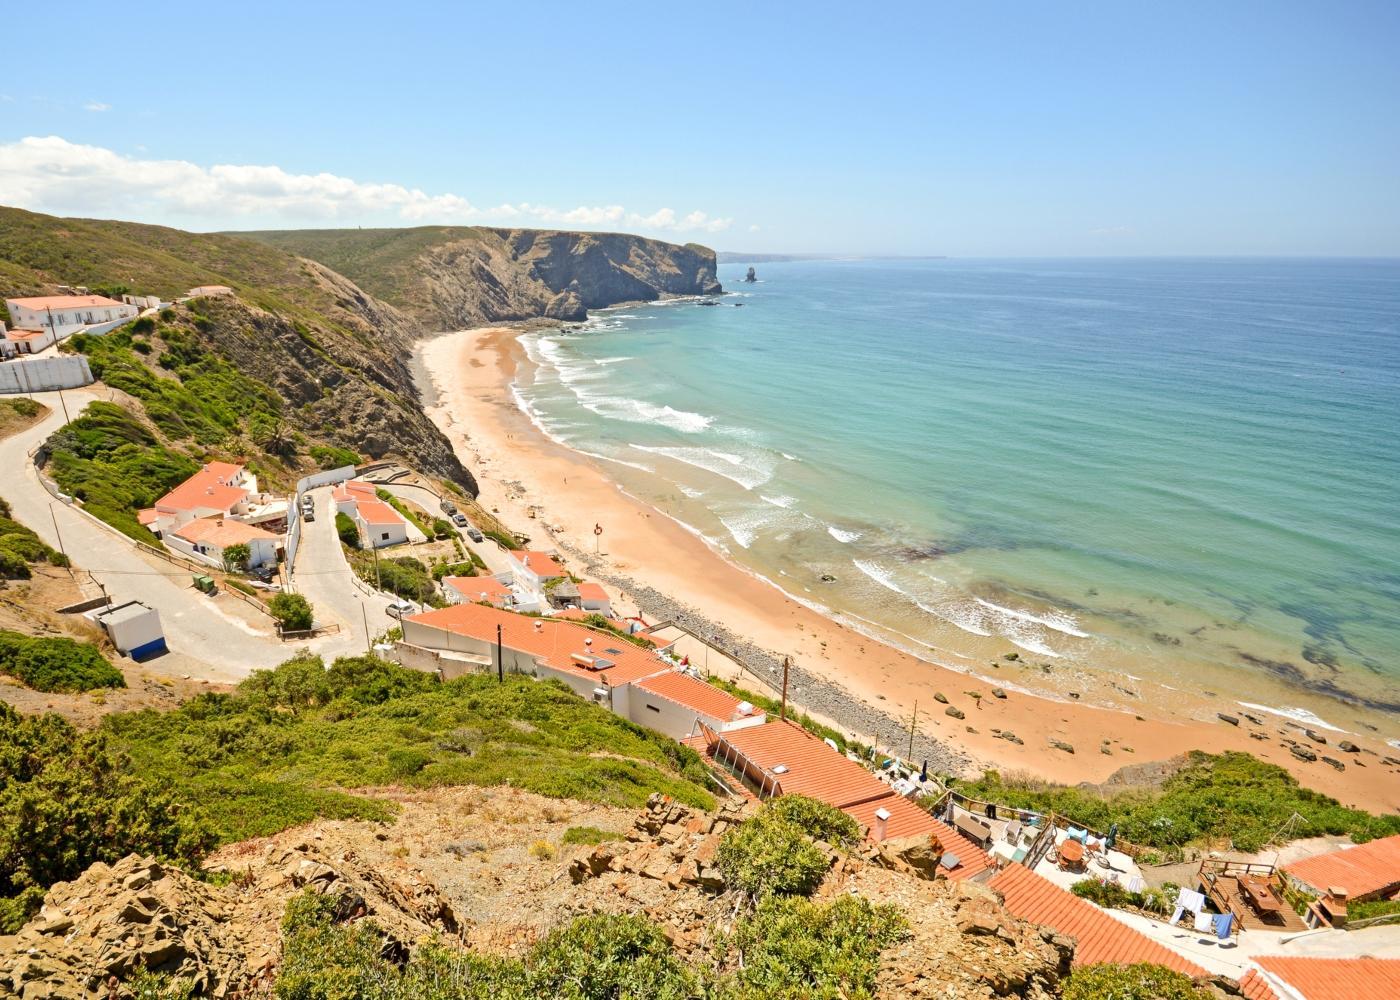 Vista panorâmica da praia da Arrifana